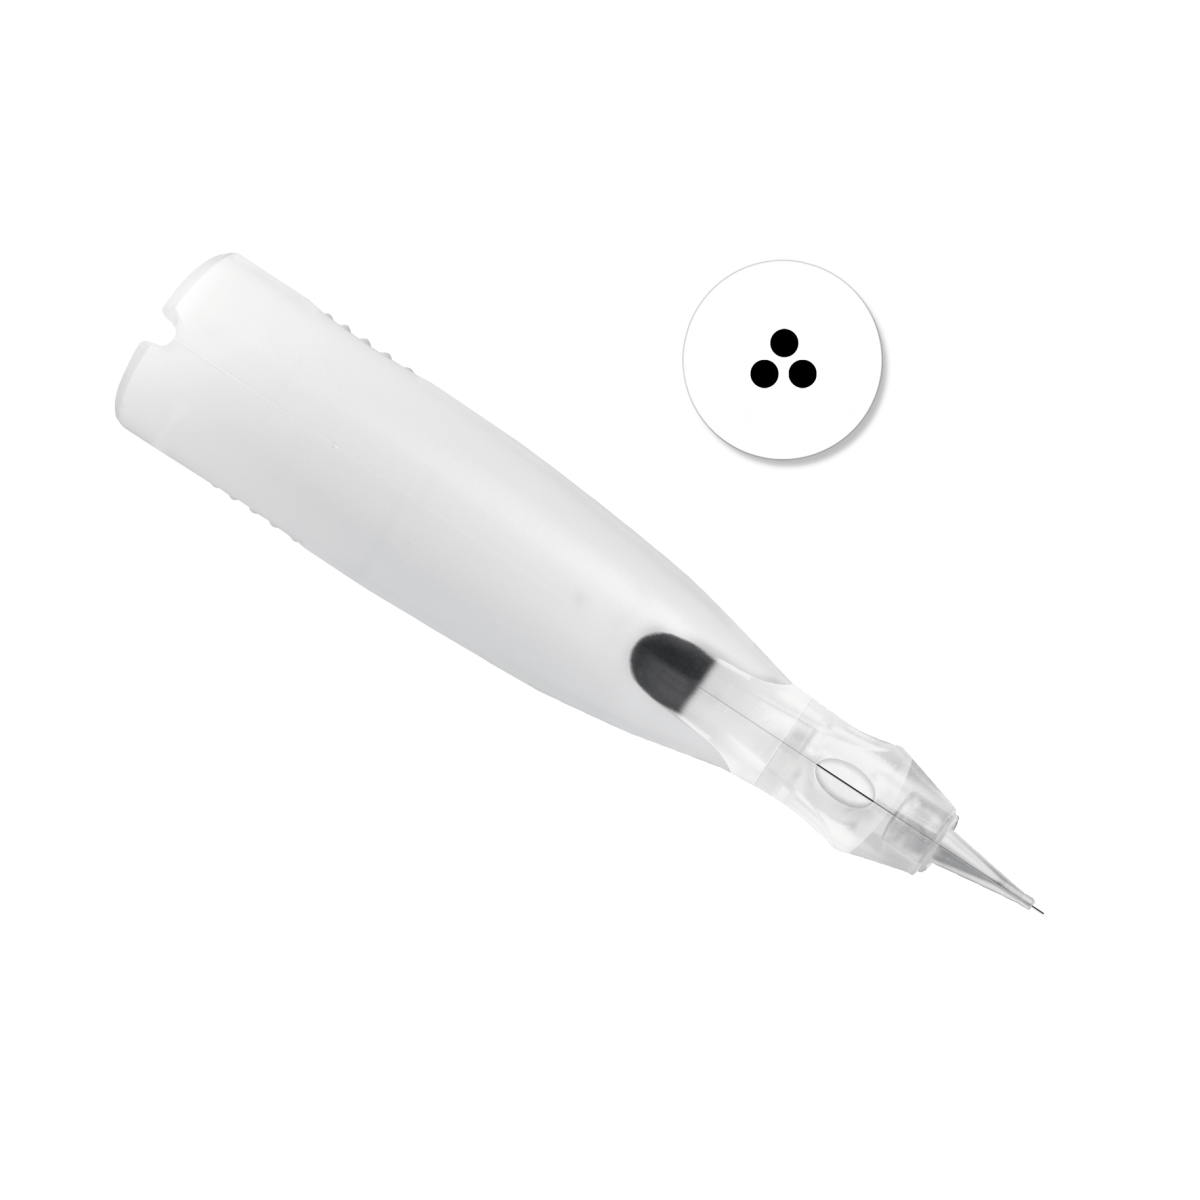 3 LINER (0,33 mm) PRECISE